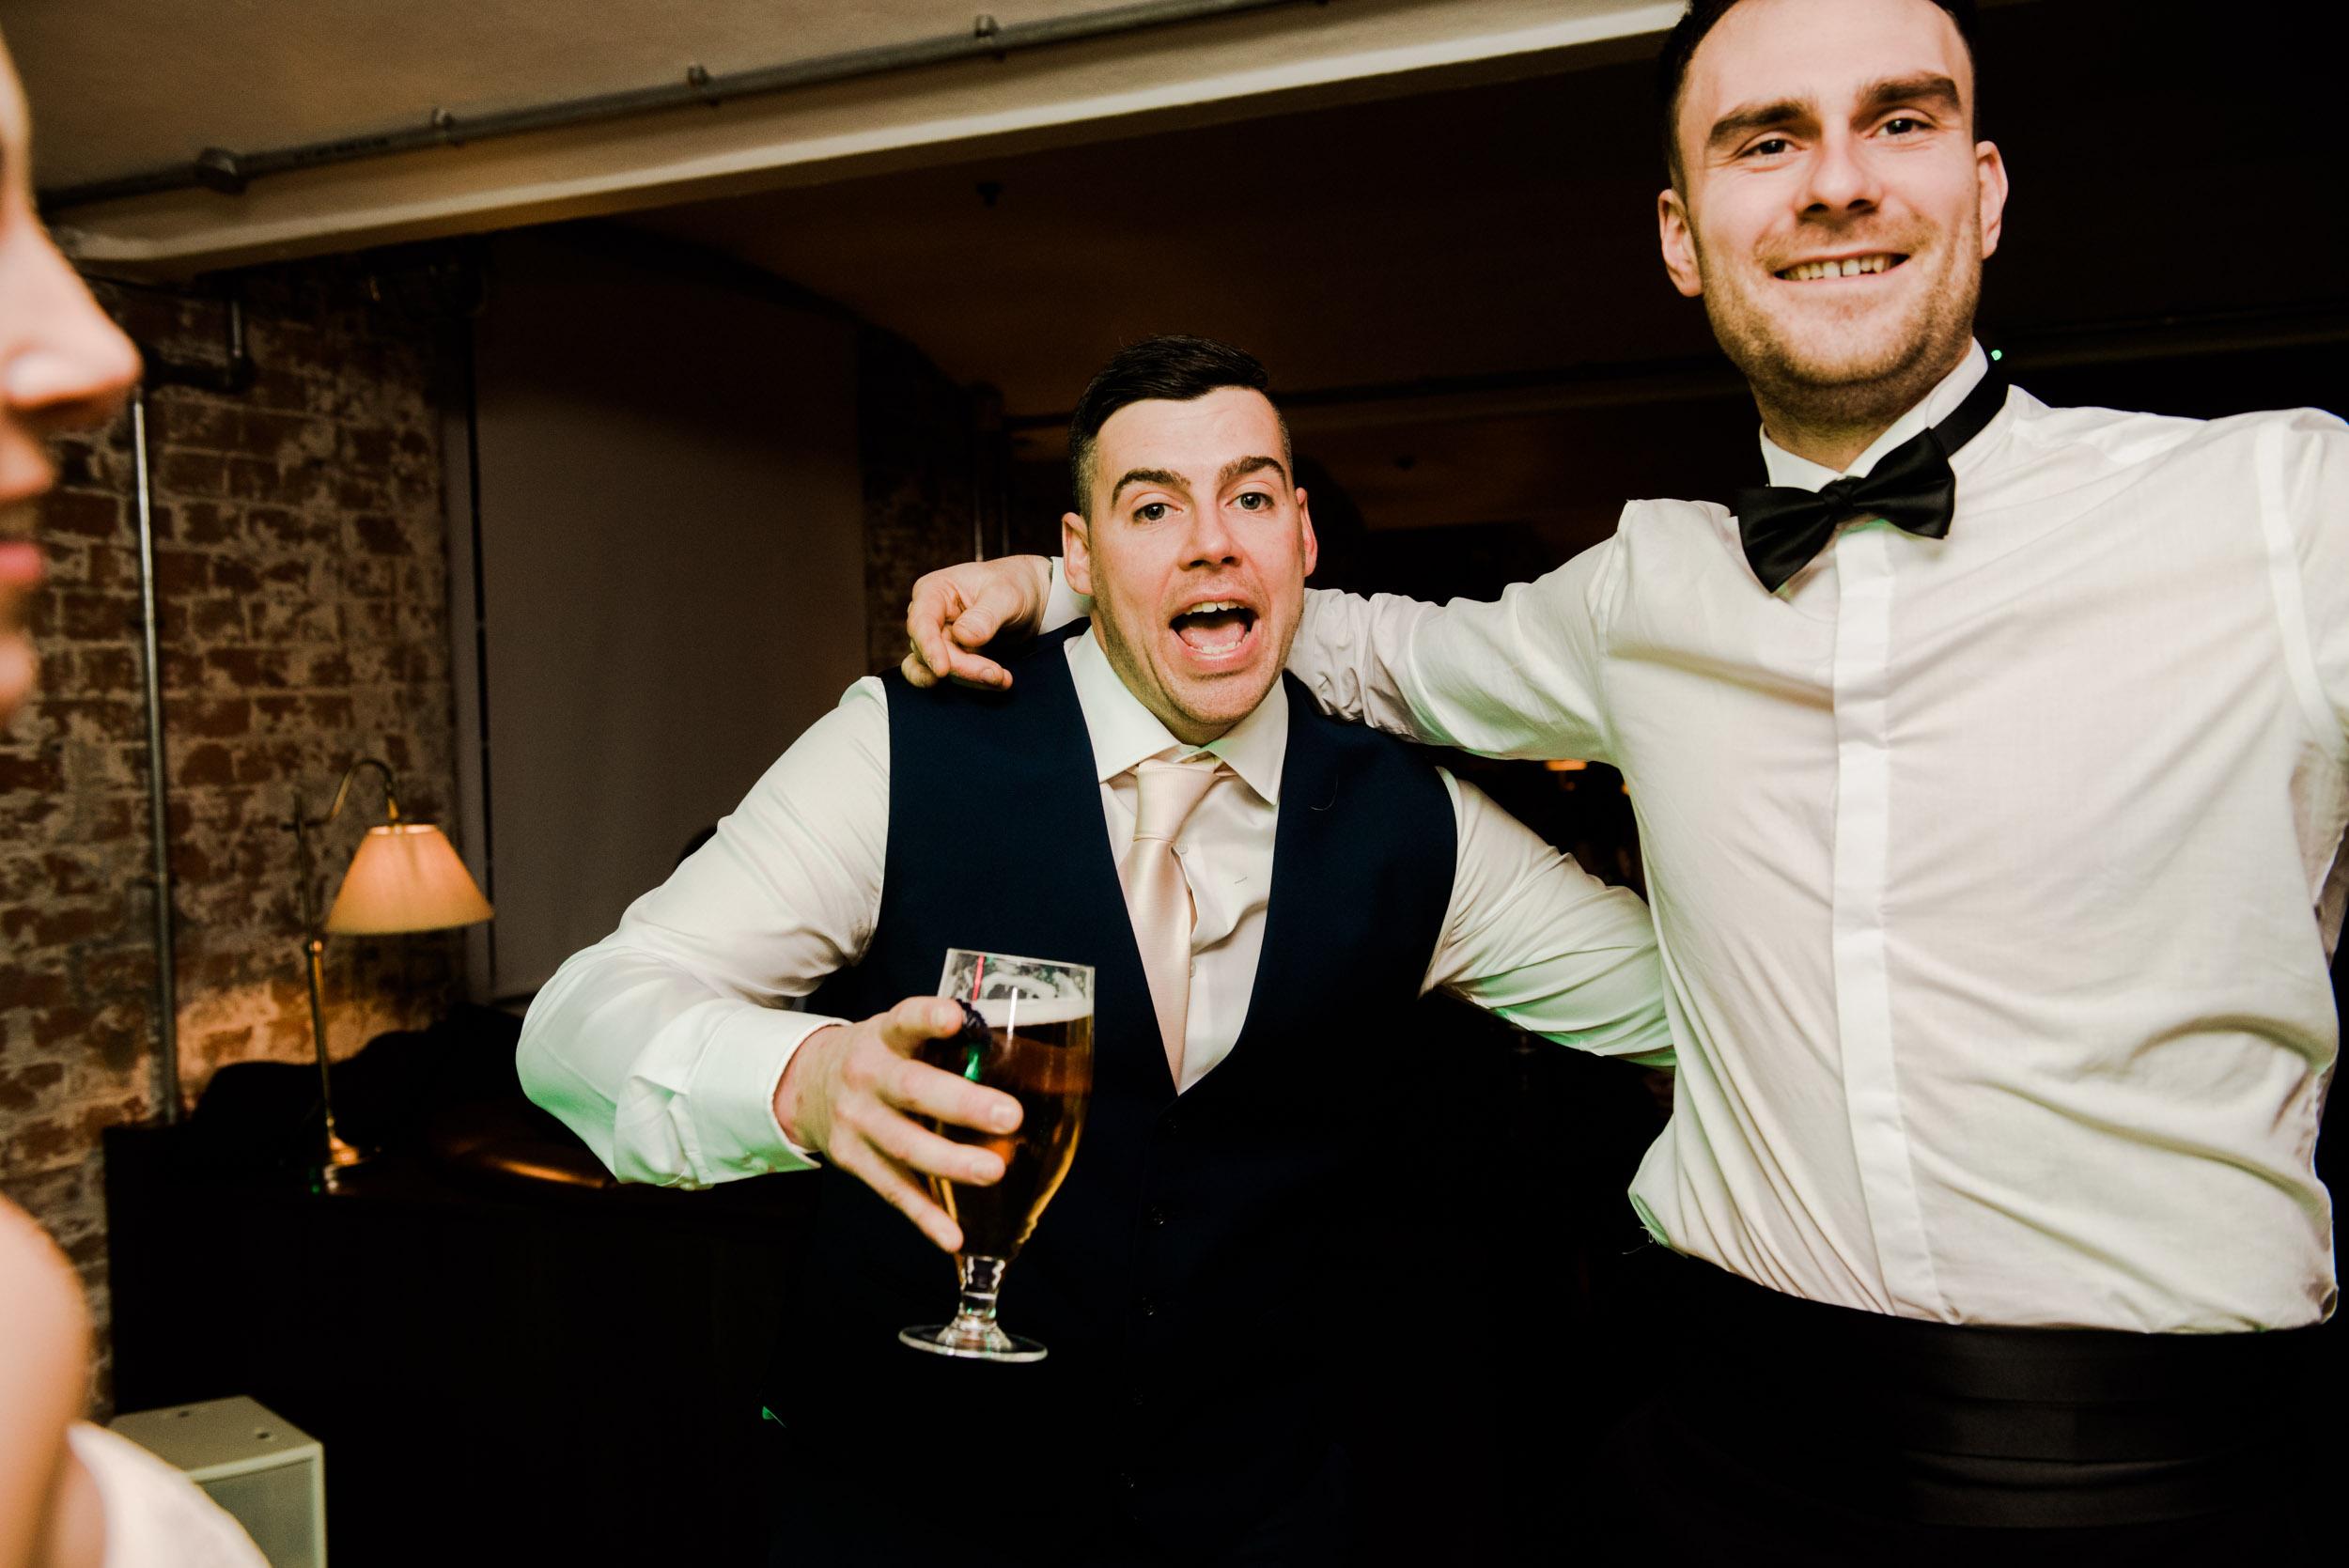 Industrial_glamour_wedding_west_mill_derby184